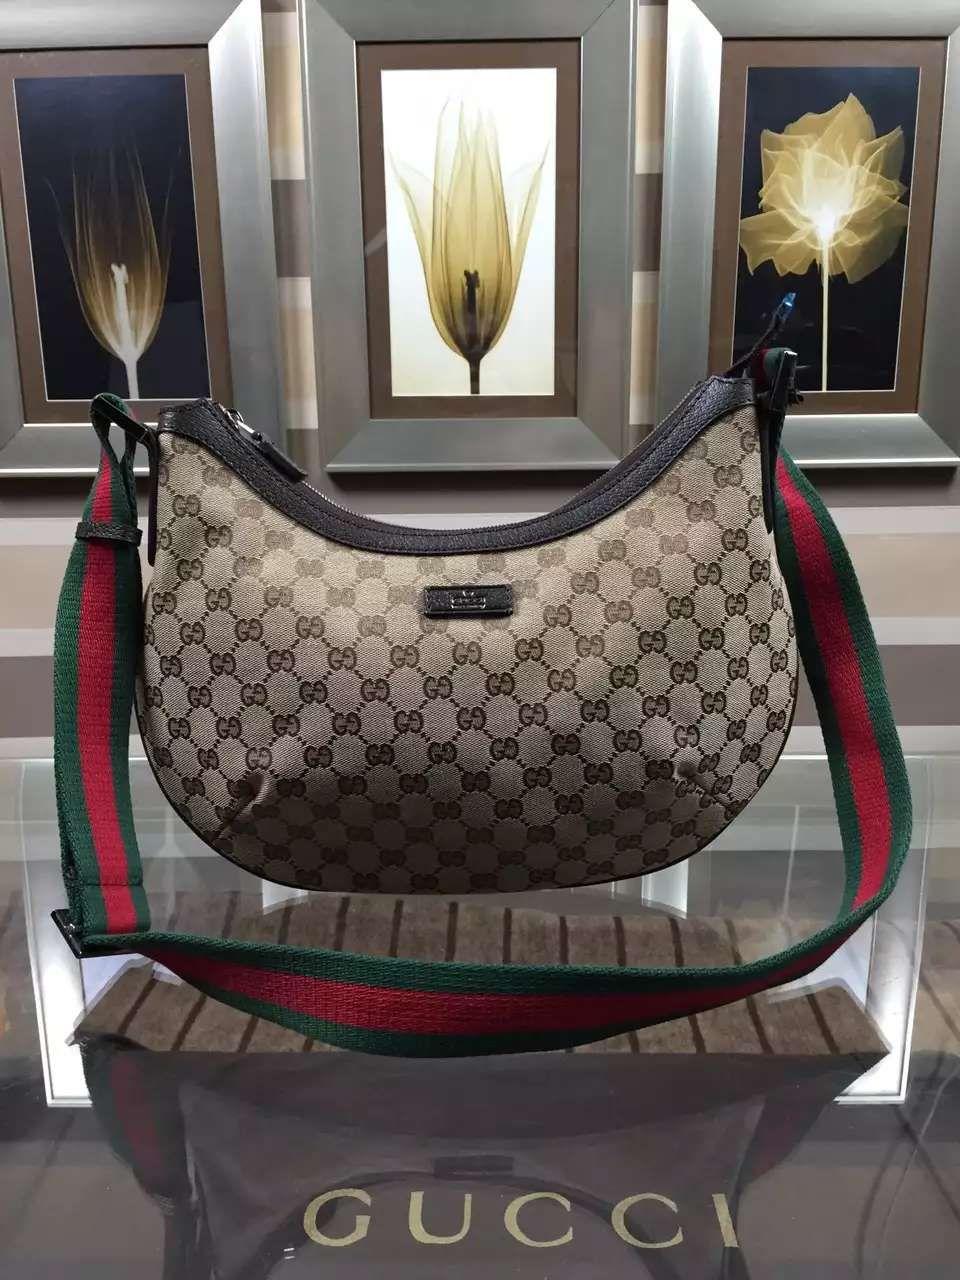 gucci Bag, ID   29930(FORSALE a yybags.com), gucci designer bags ... 6dcb434ec2